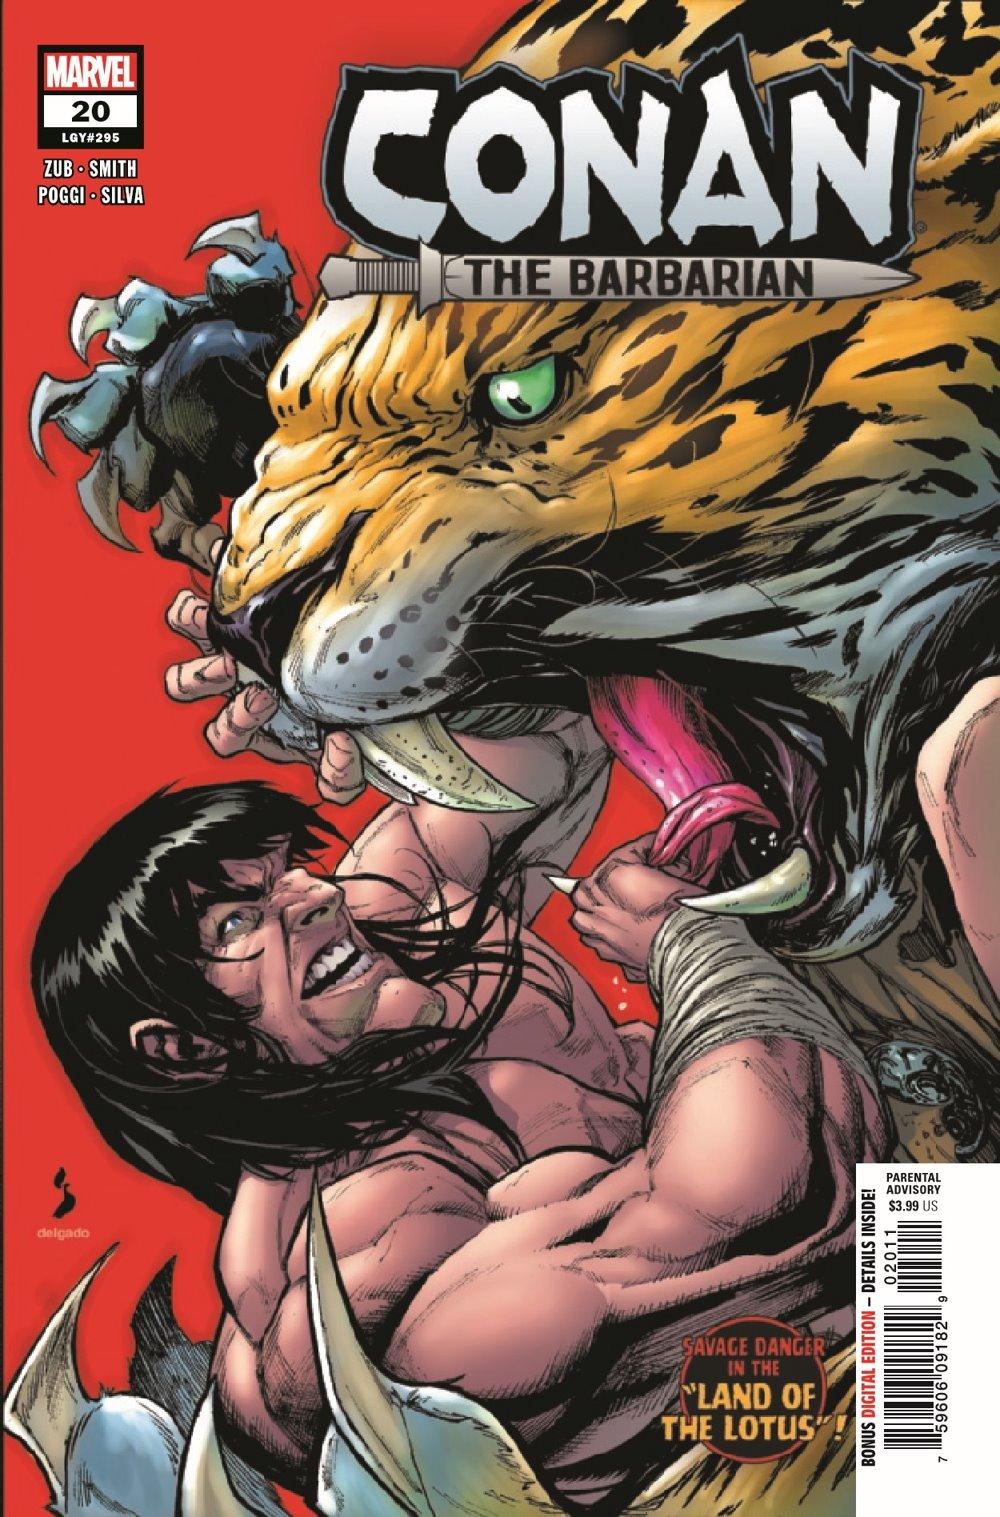 CONANBARB2019020_Preview-1 ComicList Previews: CONAN THE BARBARIAN #20